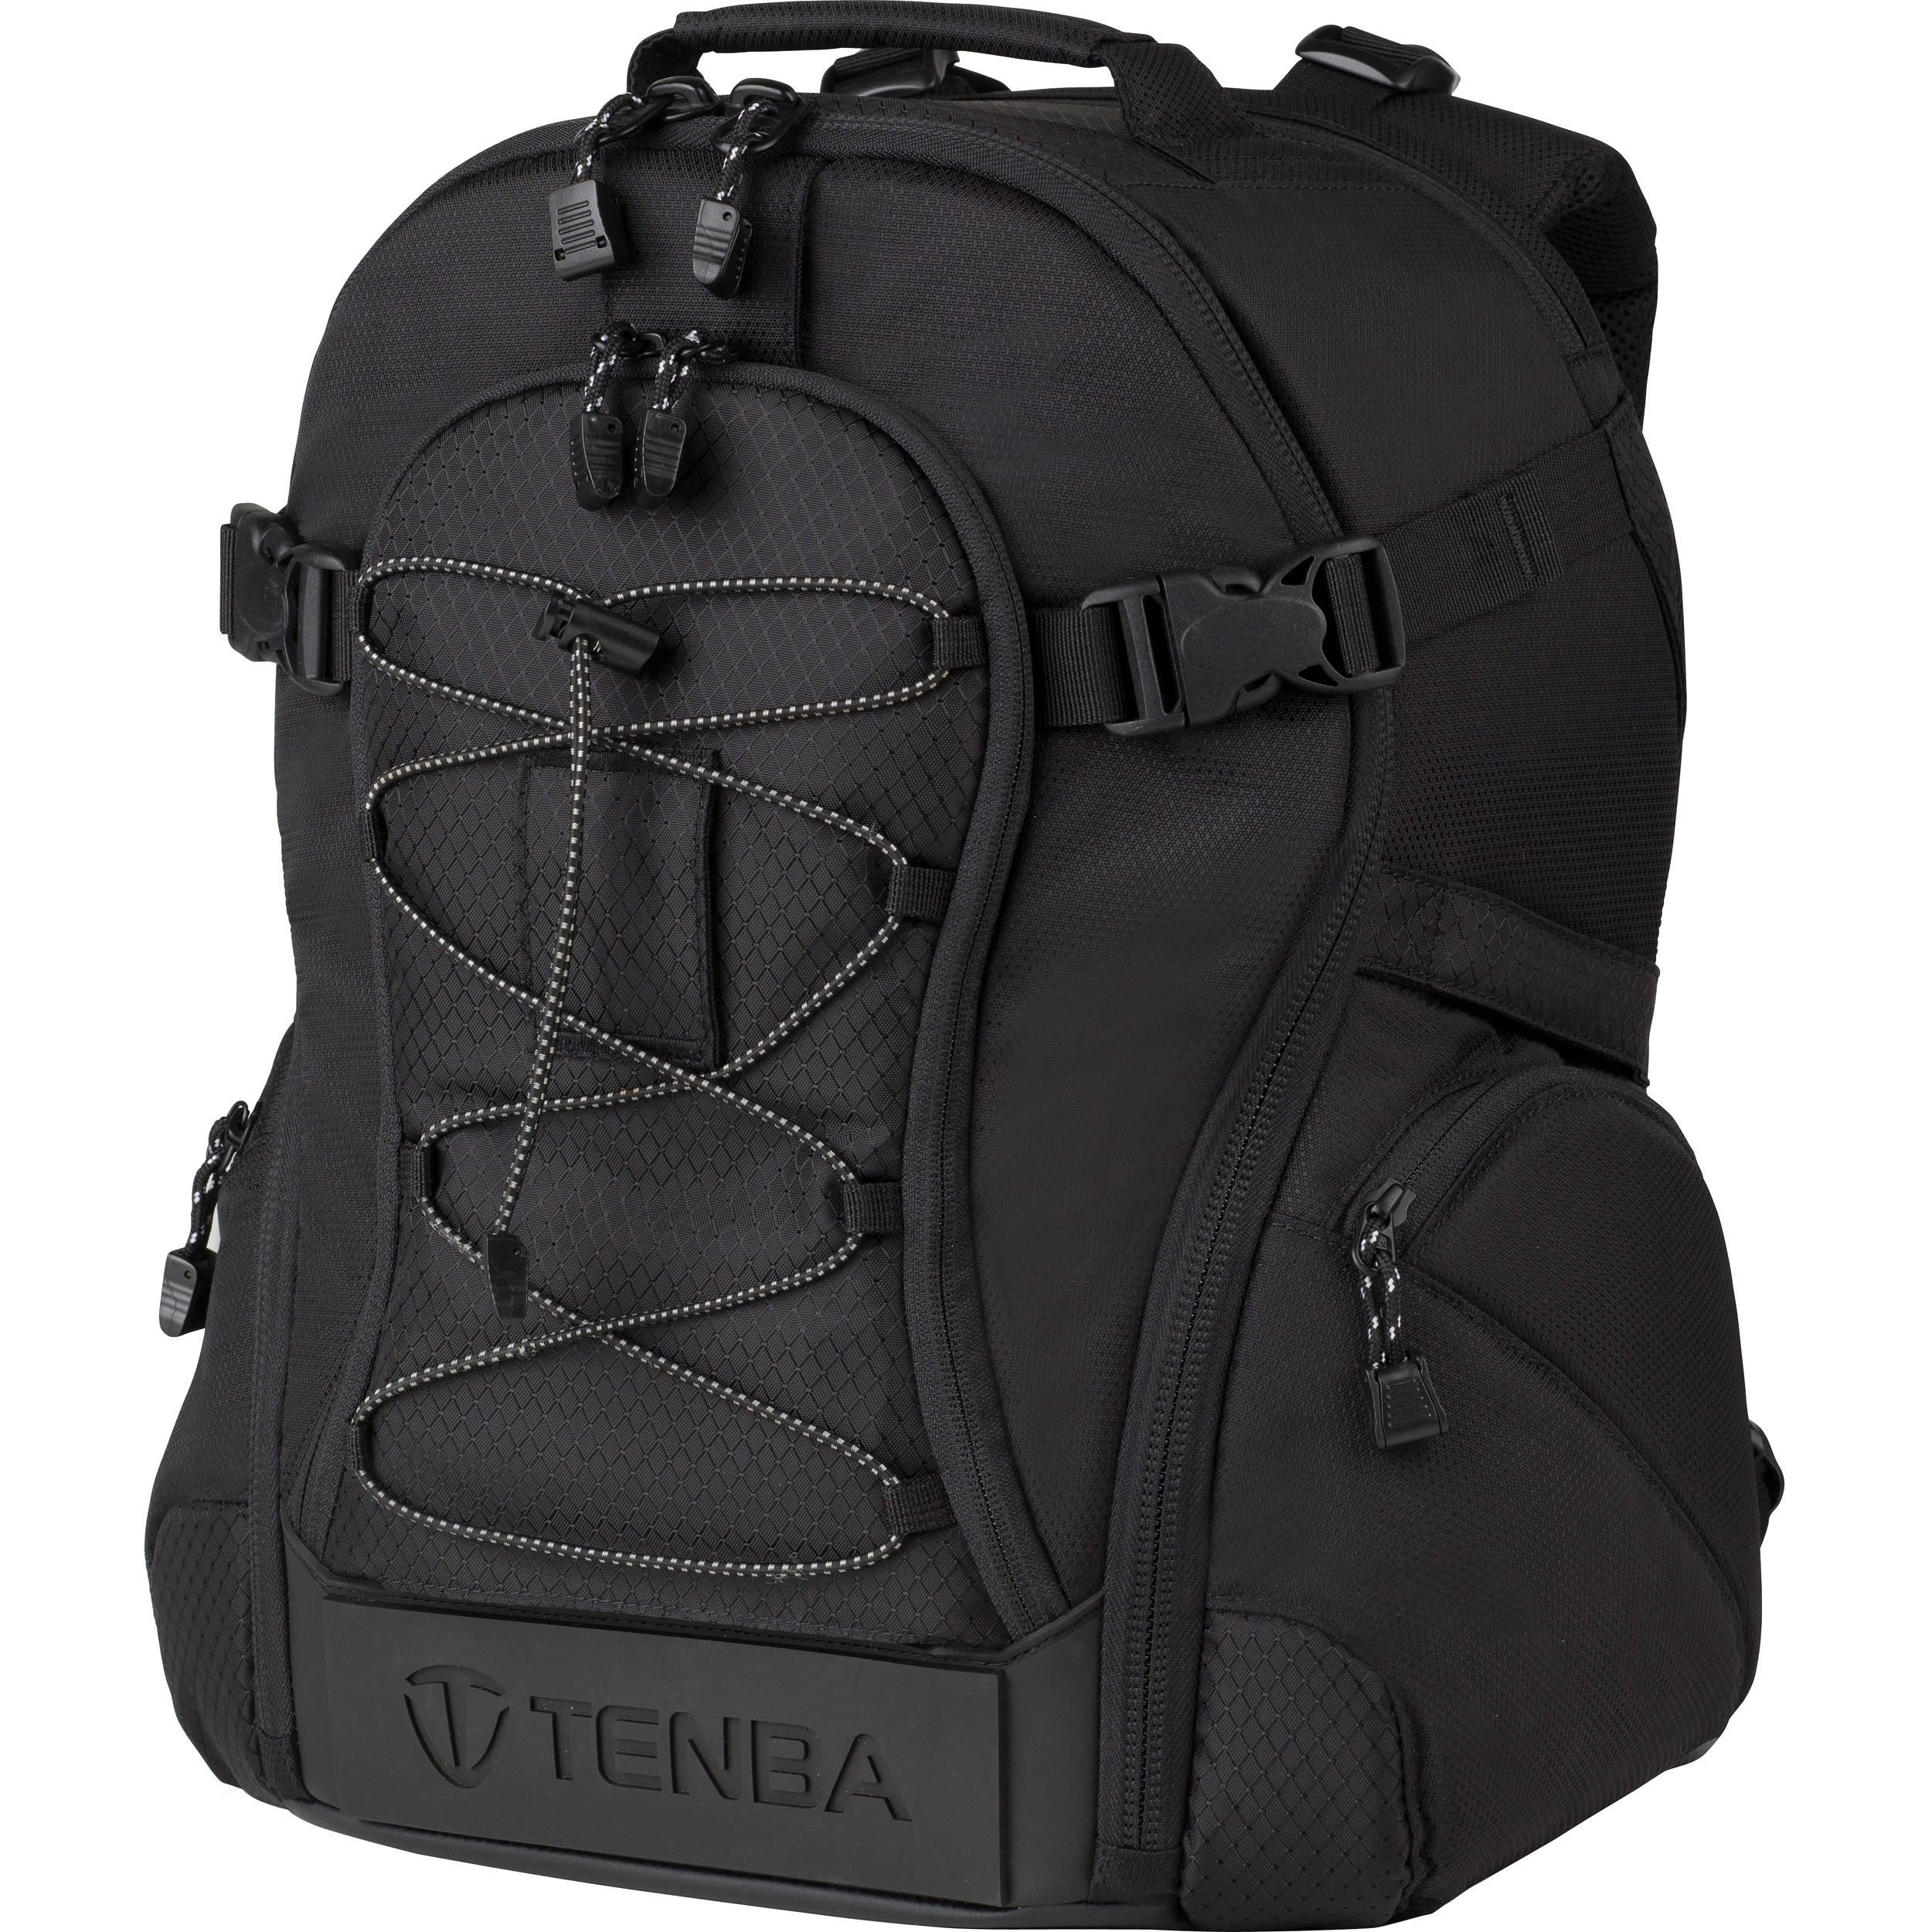 a294cc3bf0 Tenba Shootout Backpack LE (Small) 632-305 B H Photo Video